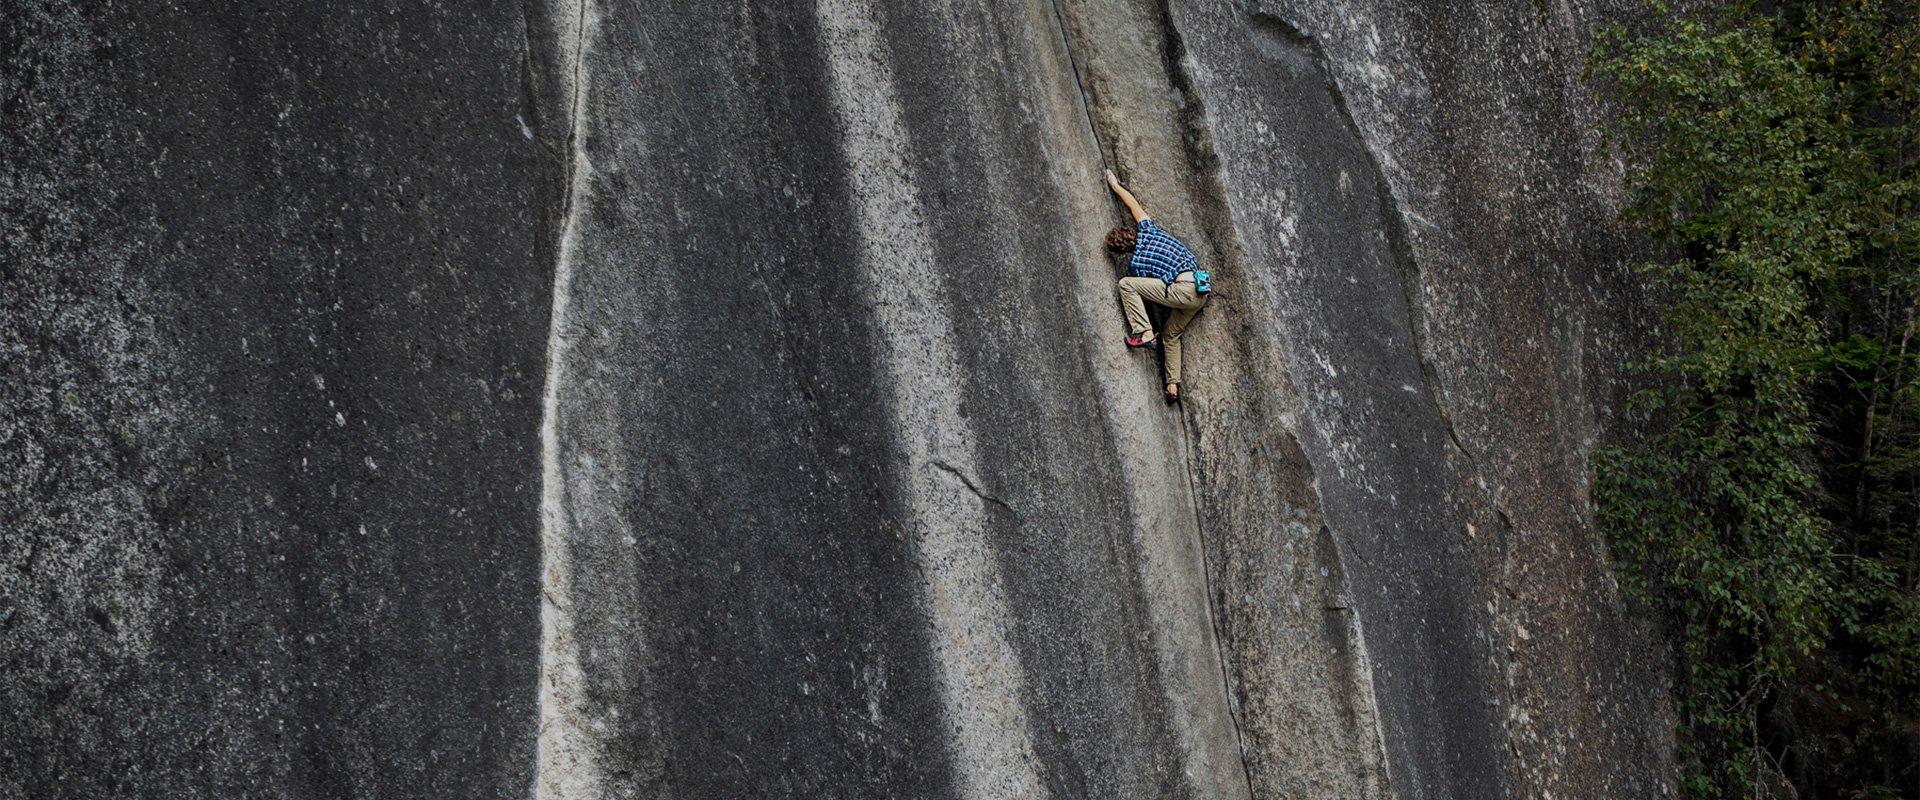 vimff best of climbing online crack climbing with will stanhope arcteryx clinic title bg